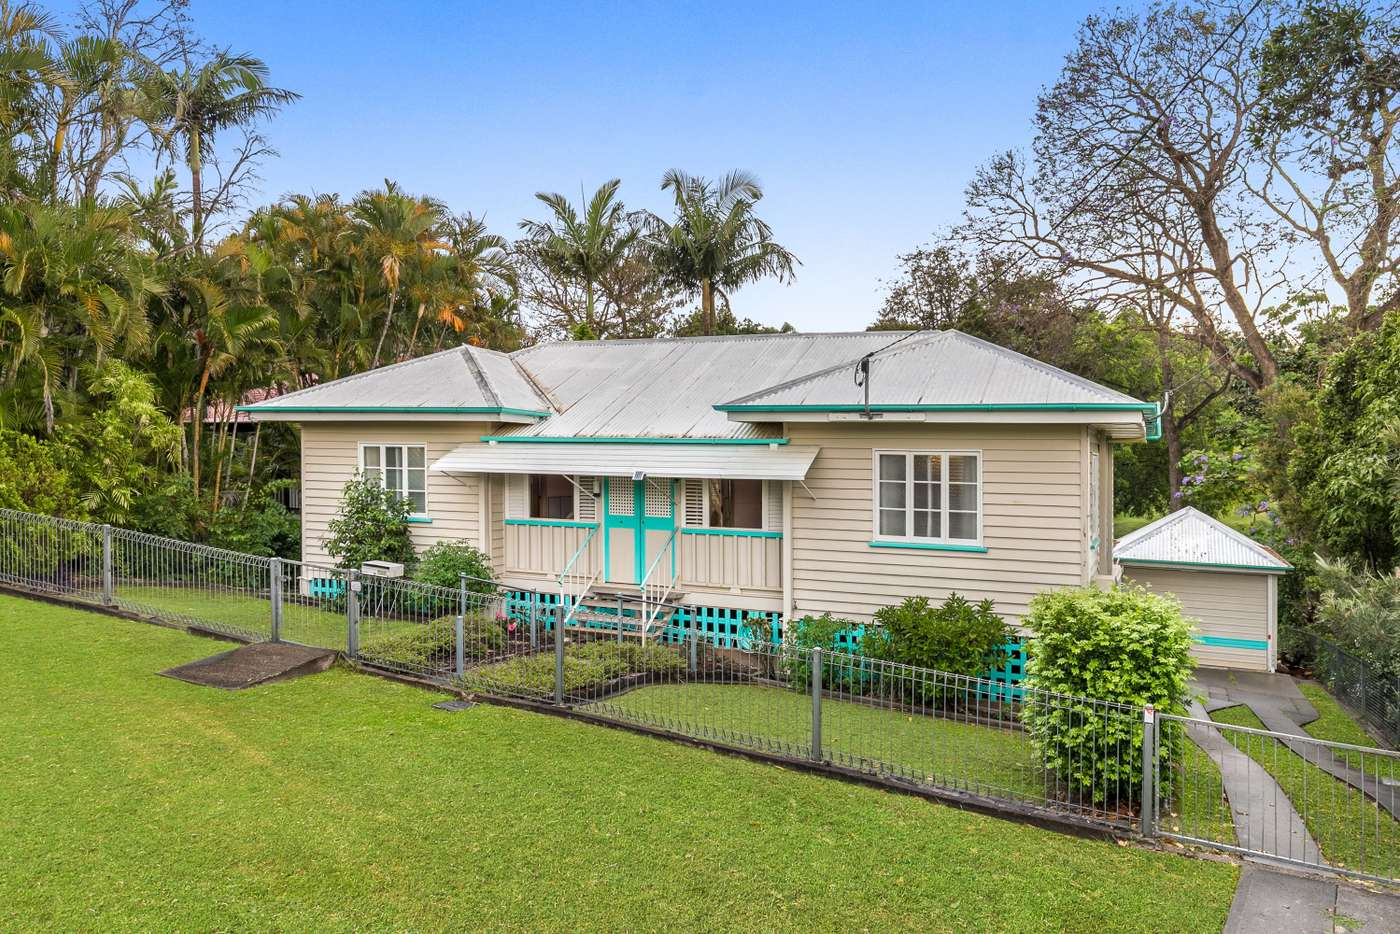 Main view of Homely house listing, 4 Royal Row, Bardon QLD 4065